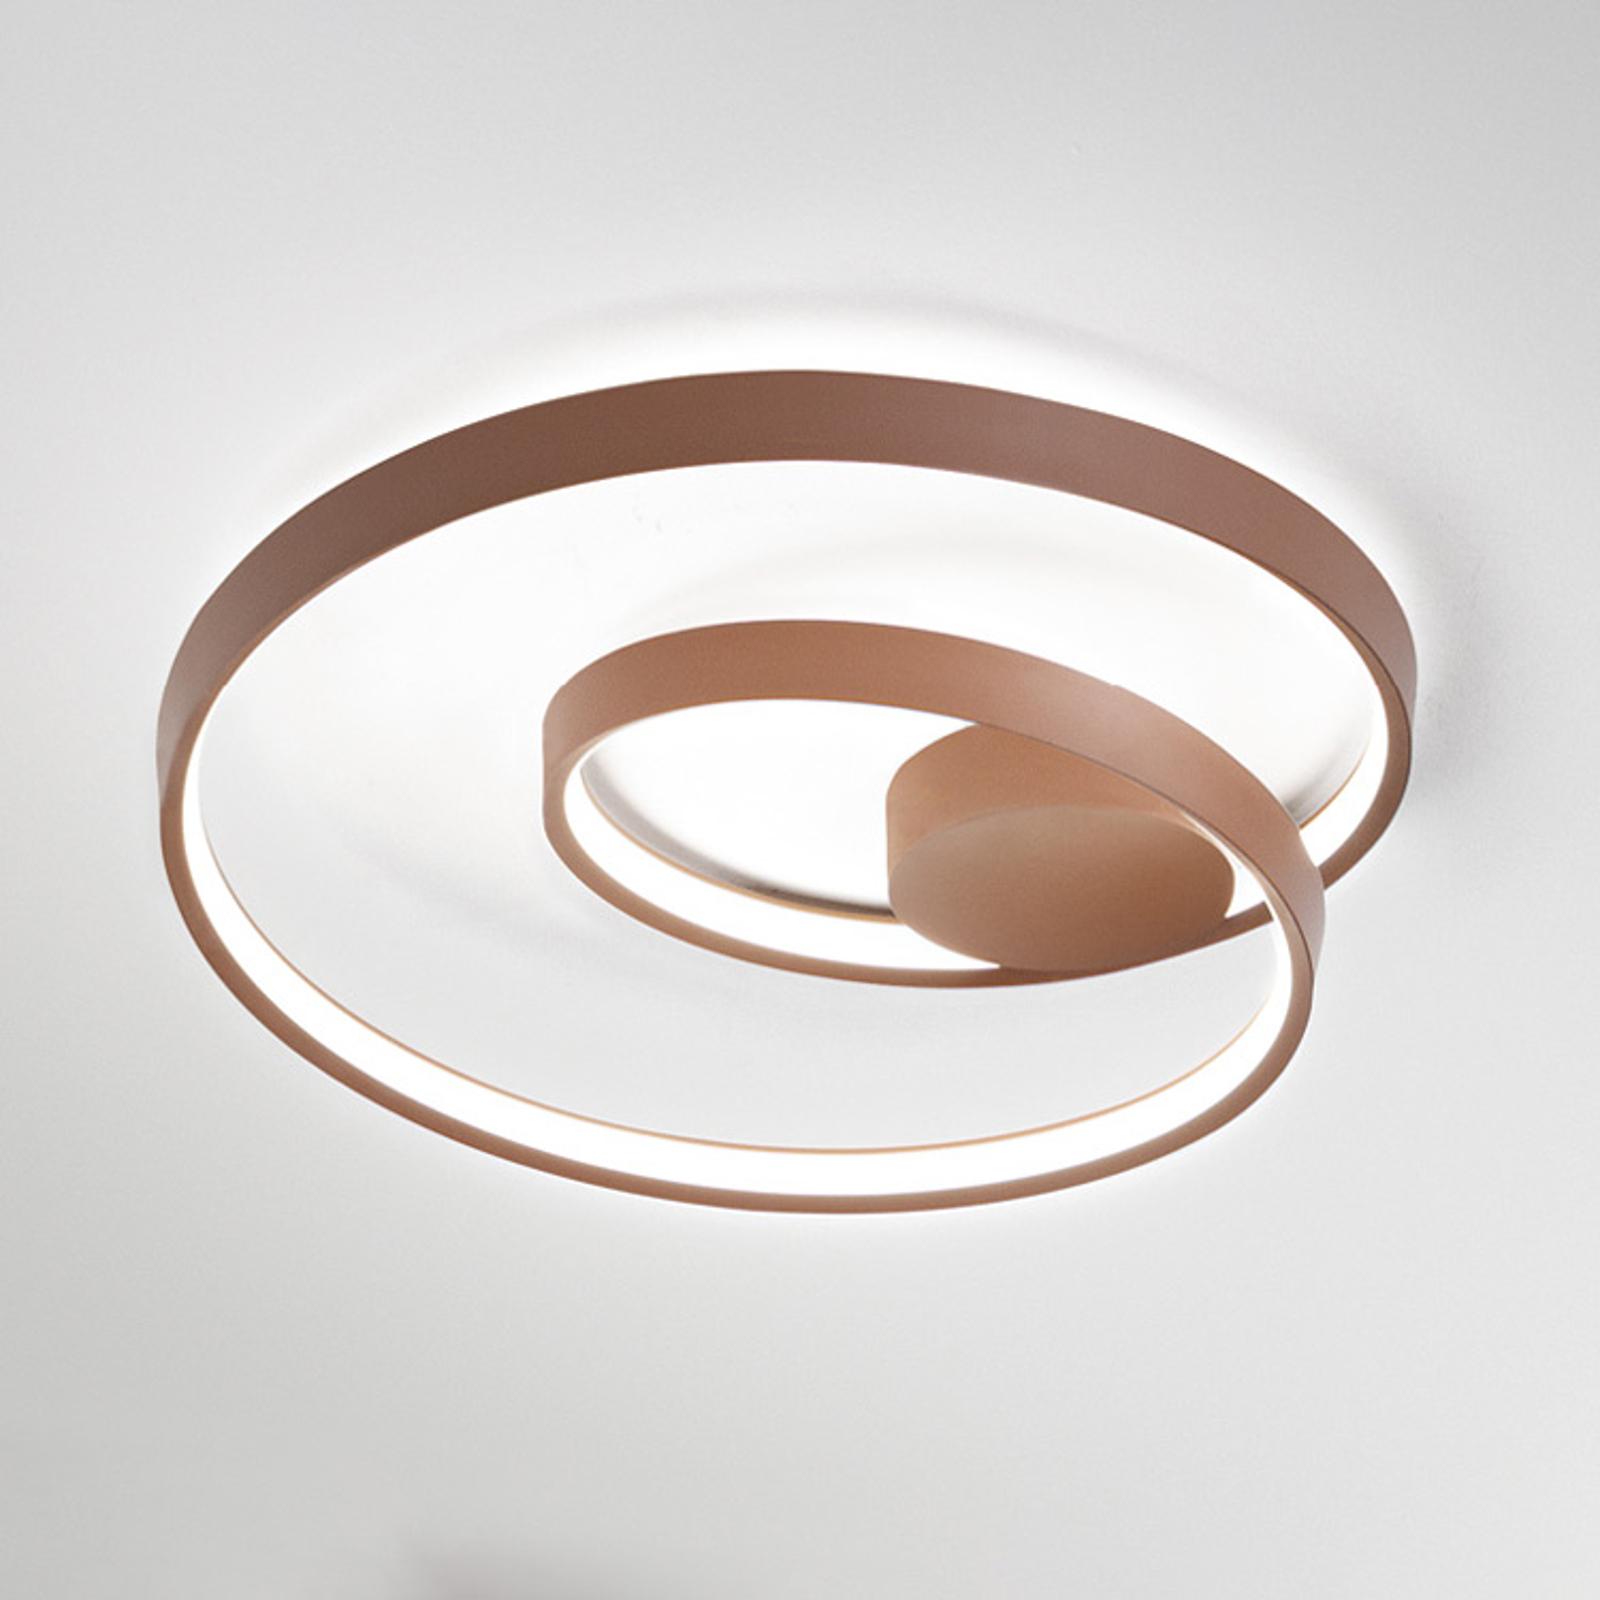 LED-taklampe Ritmo, Ø 80 cm, kanel